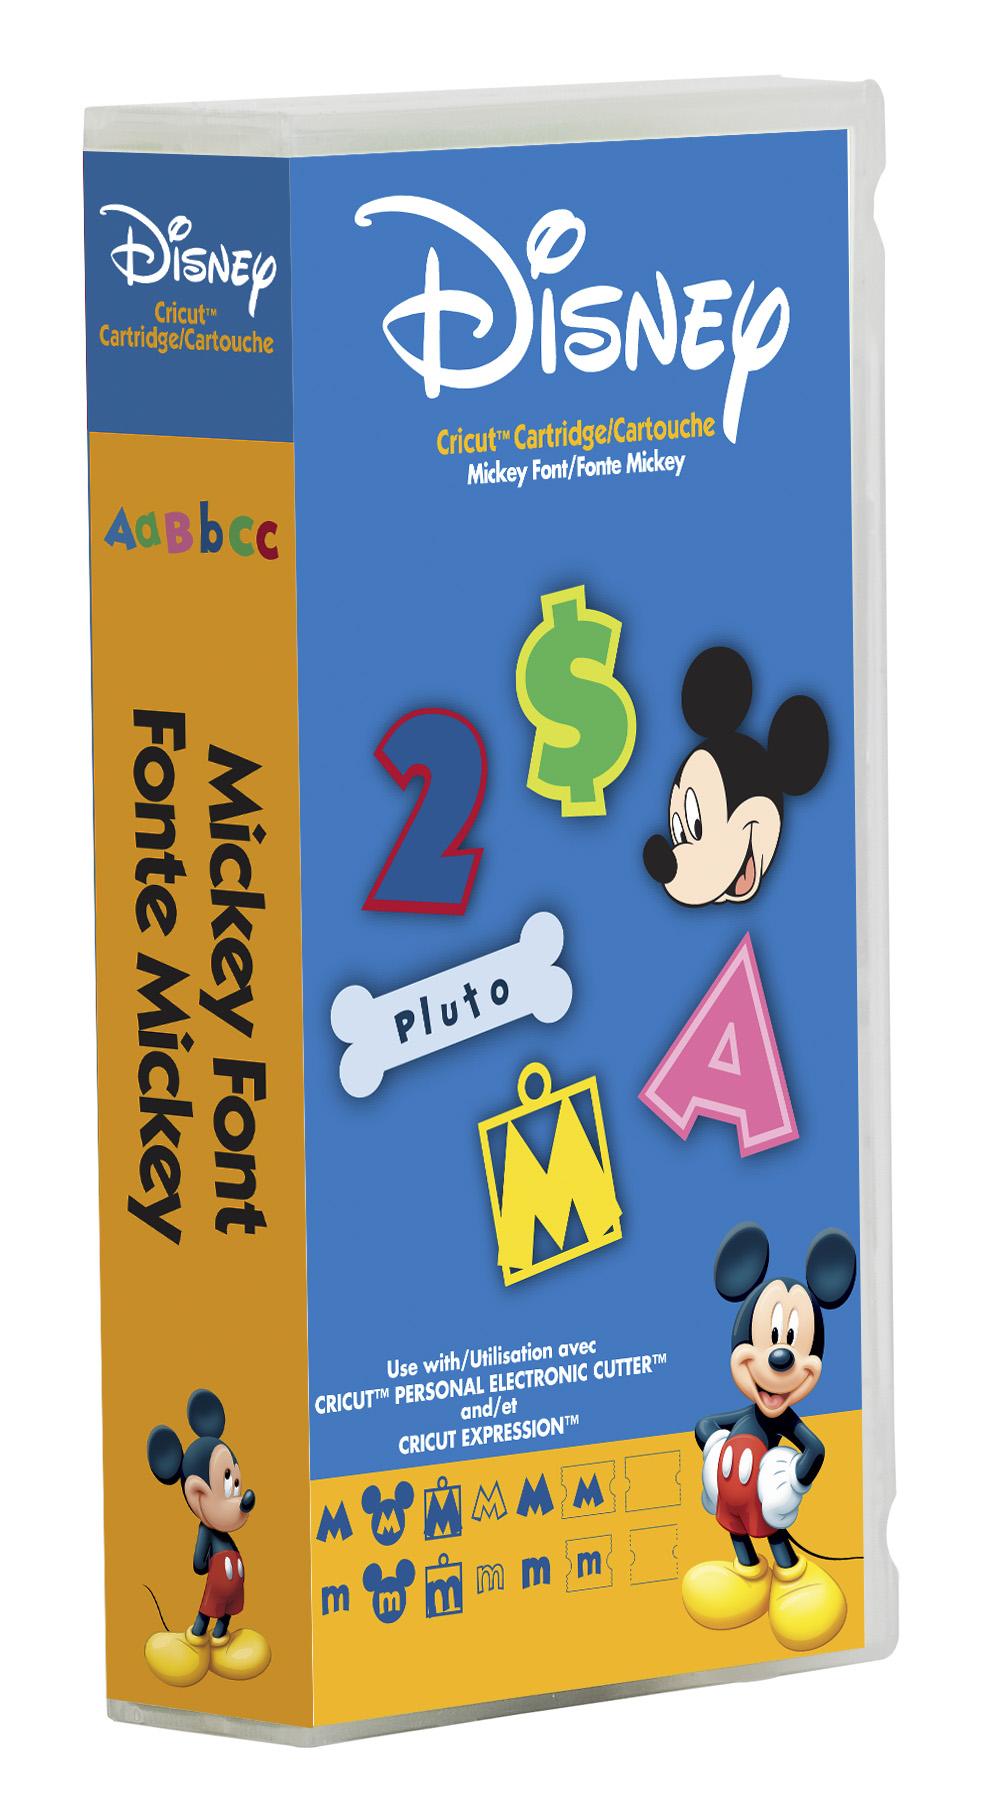 13 Disney Font Cartridge Cricut Images - Cricut Disney